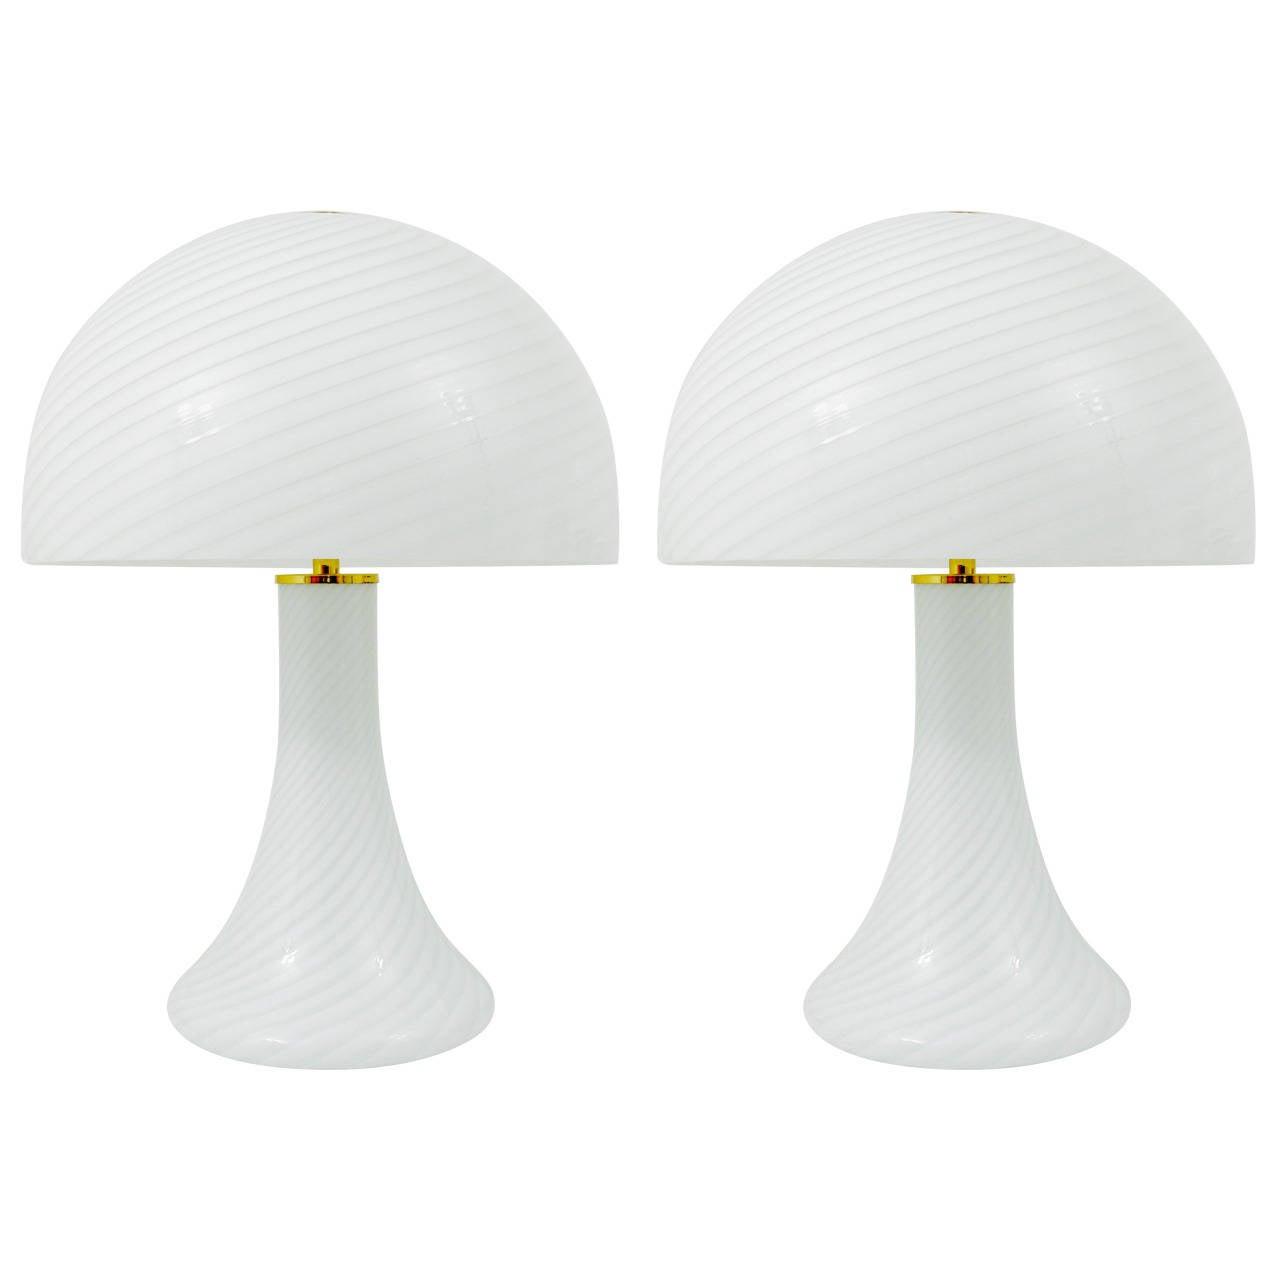 Pair of Kalmar Murano Glass and Brass Mushroom Lamps by Vistosi, 1960s